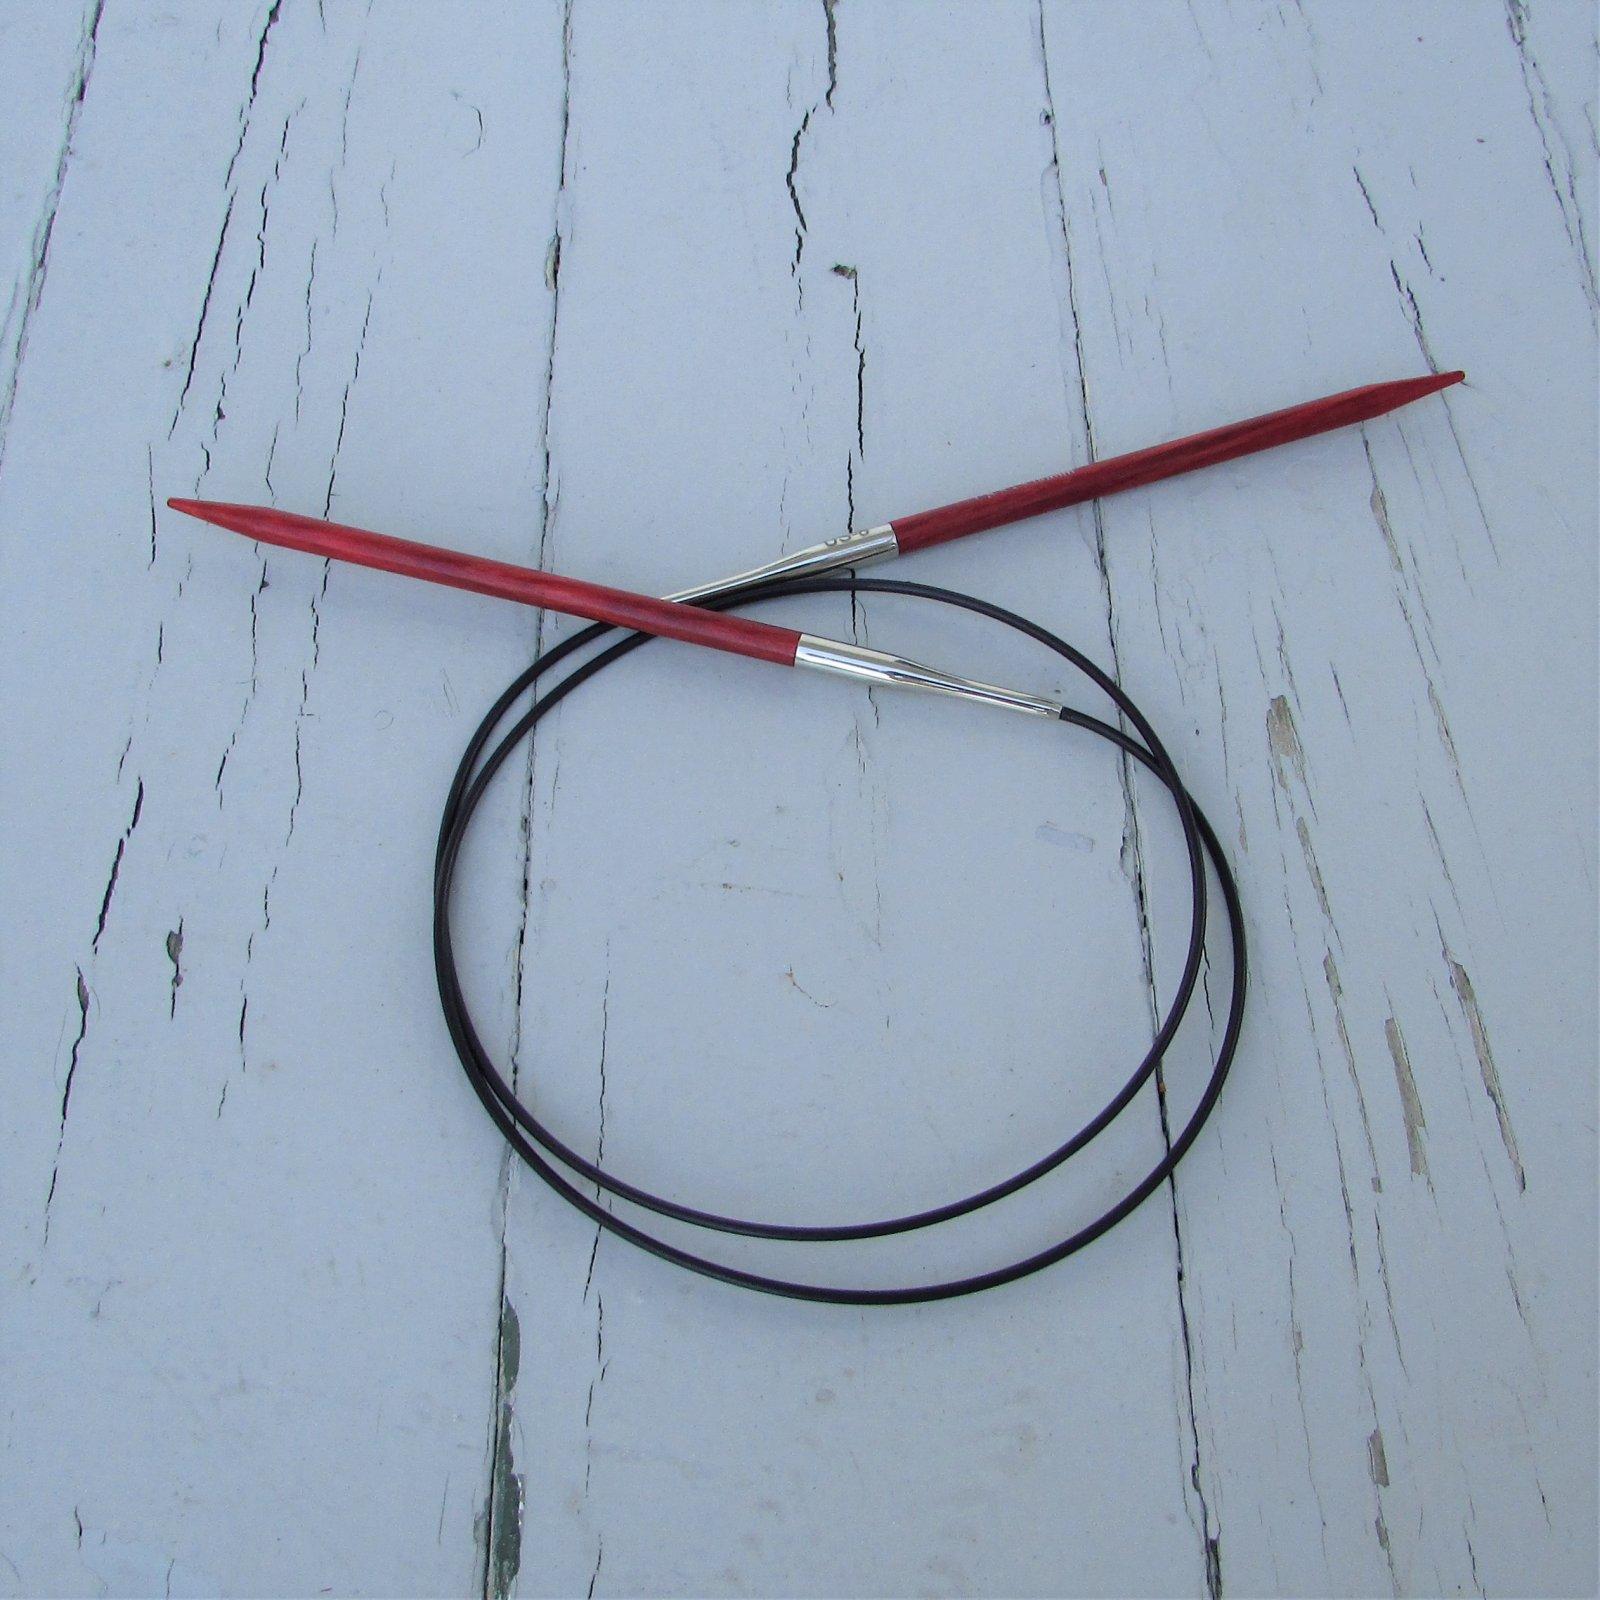 Knitter's Pride Symfonie Dreamz 32 Circular Needle